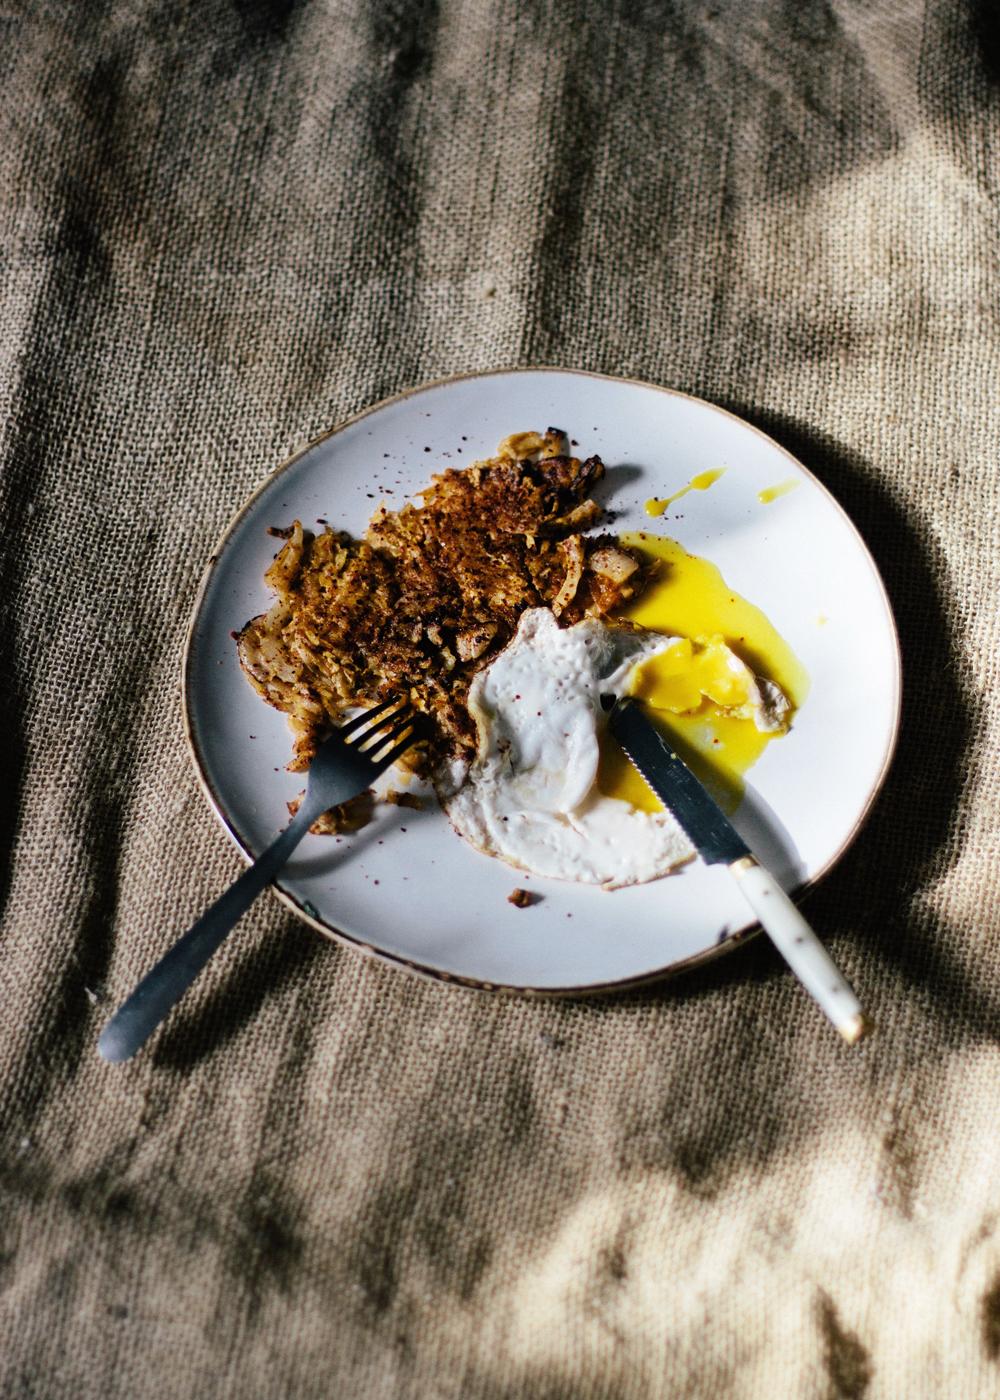 crepes de patata al estilo de sichuan